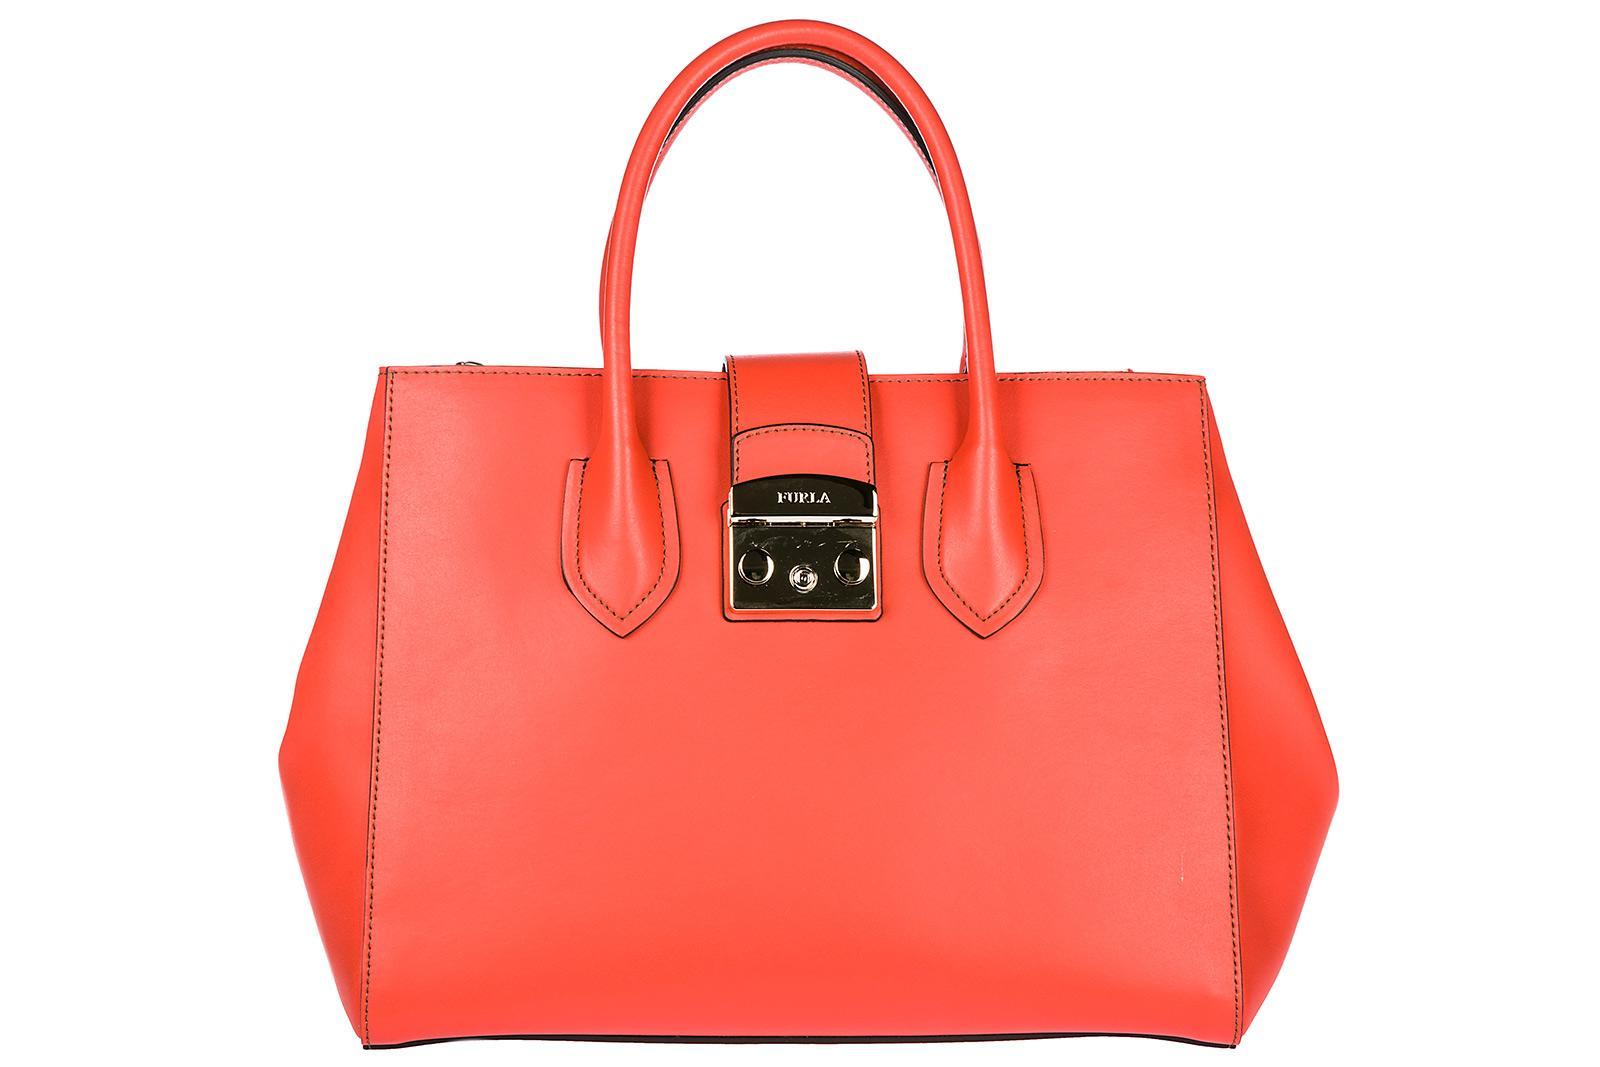 Furla Women's Leather Handbag Shopping Bag Purse Metropolis In Orange